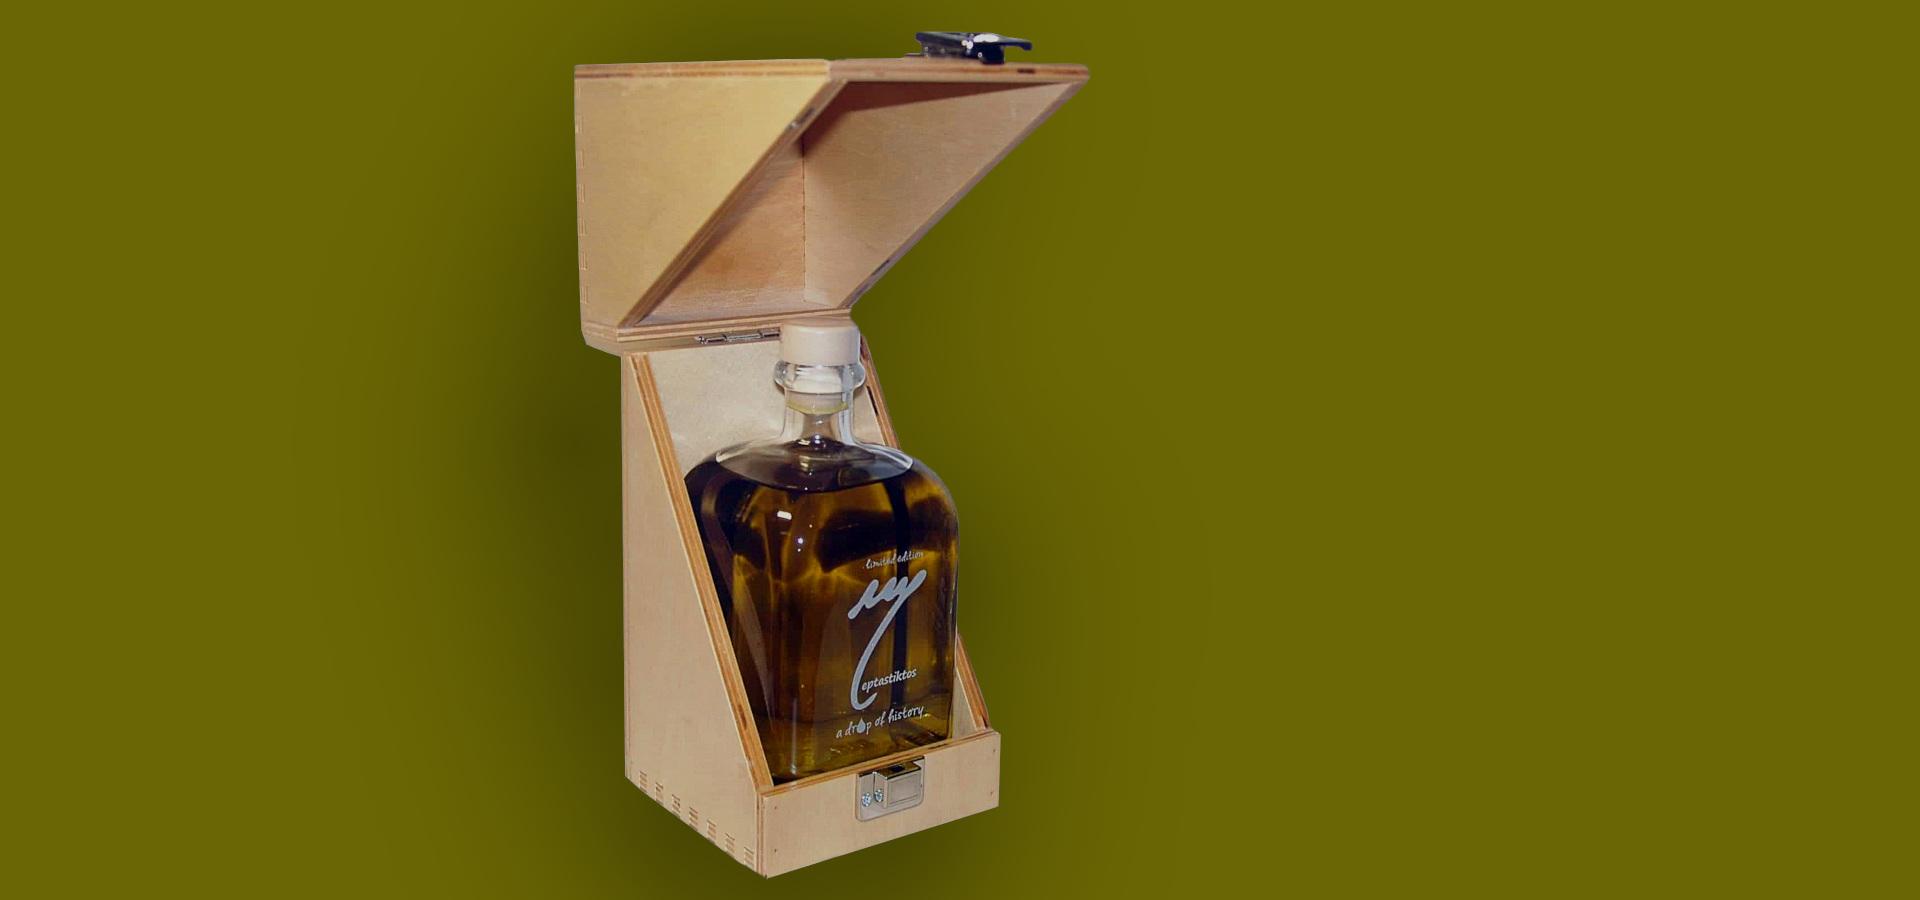 Collectibe Bottle